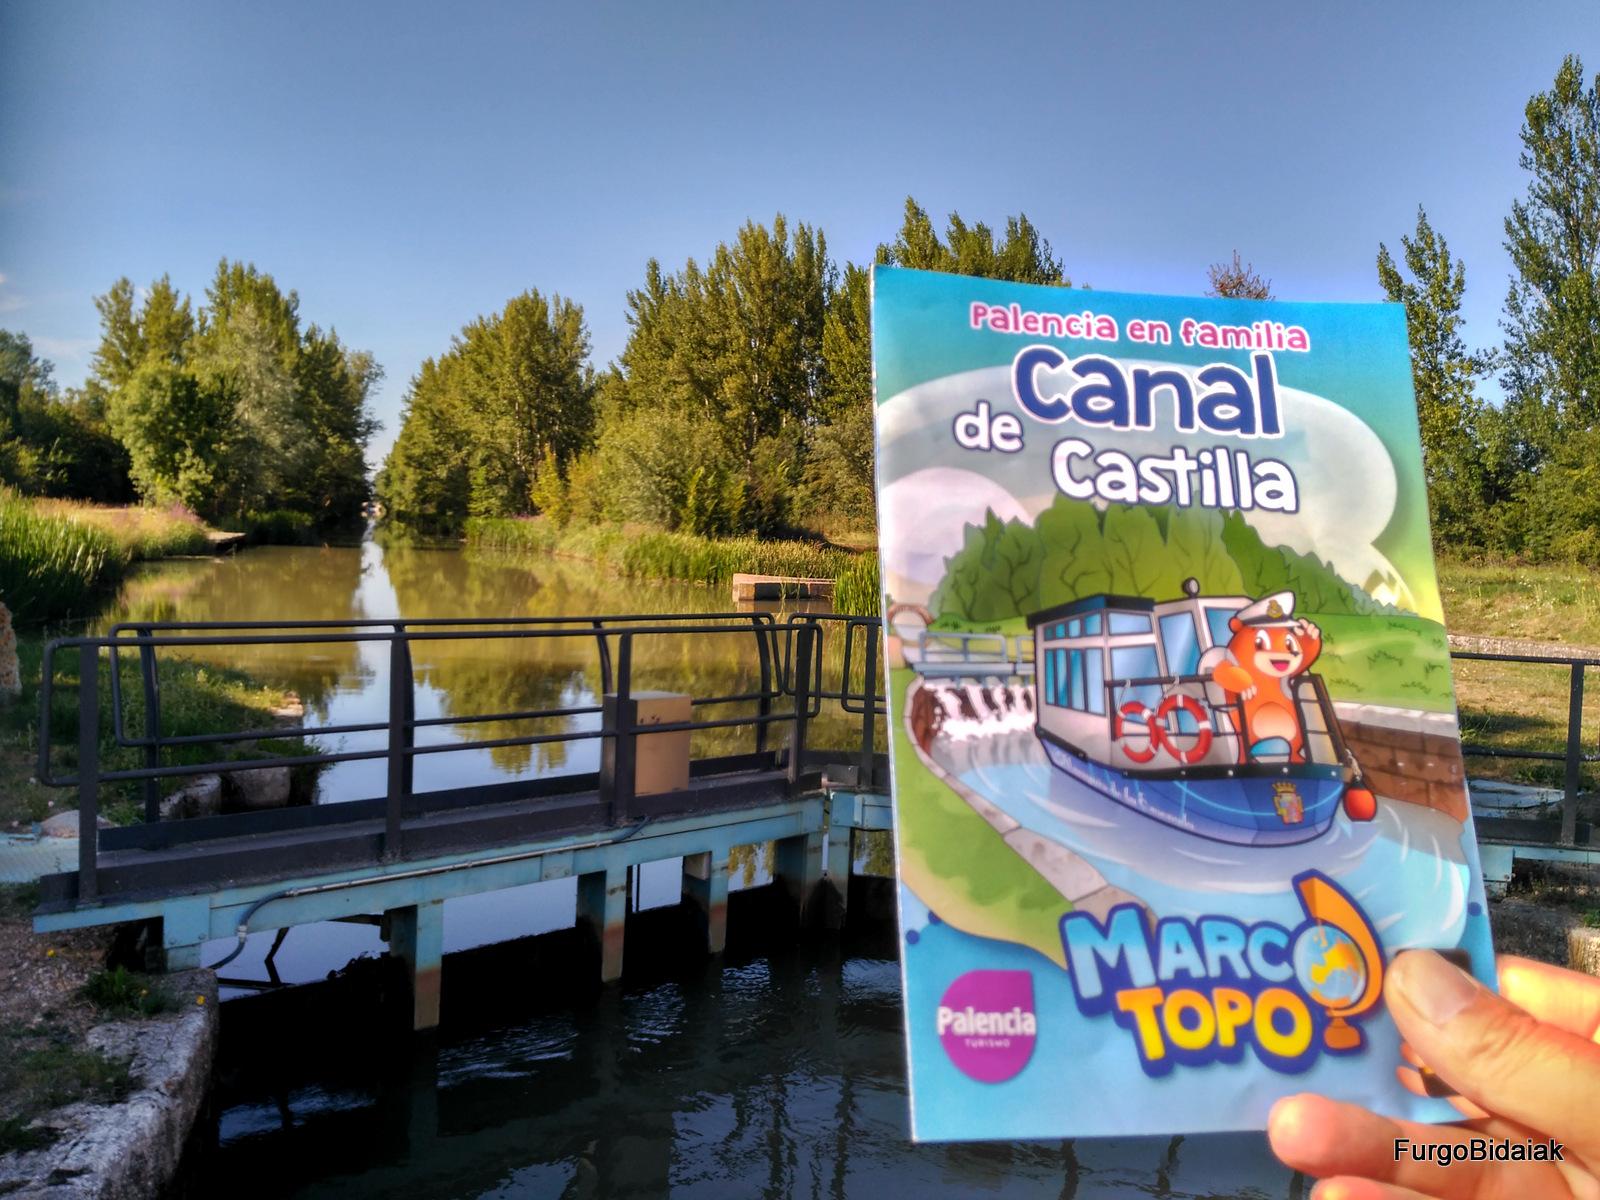 Juego interactivo Marco Topo, Herrera de Pisuerga, Canal de Castilla